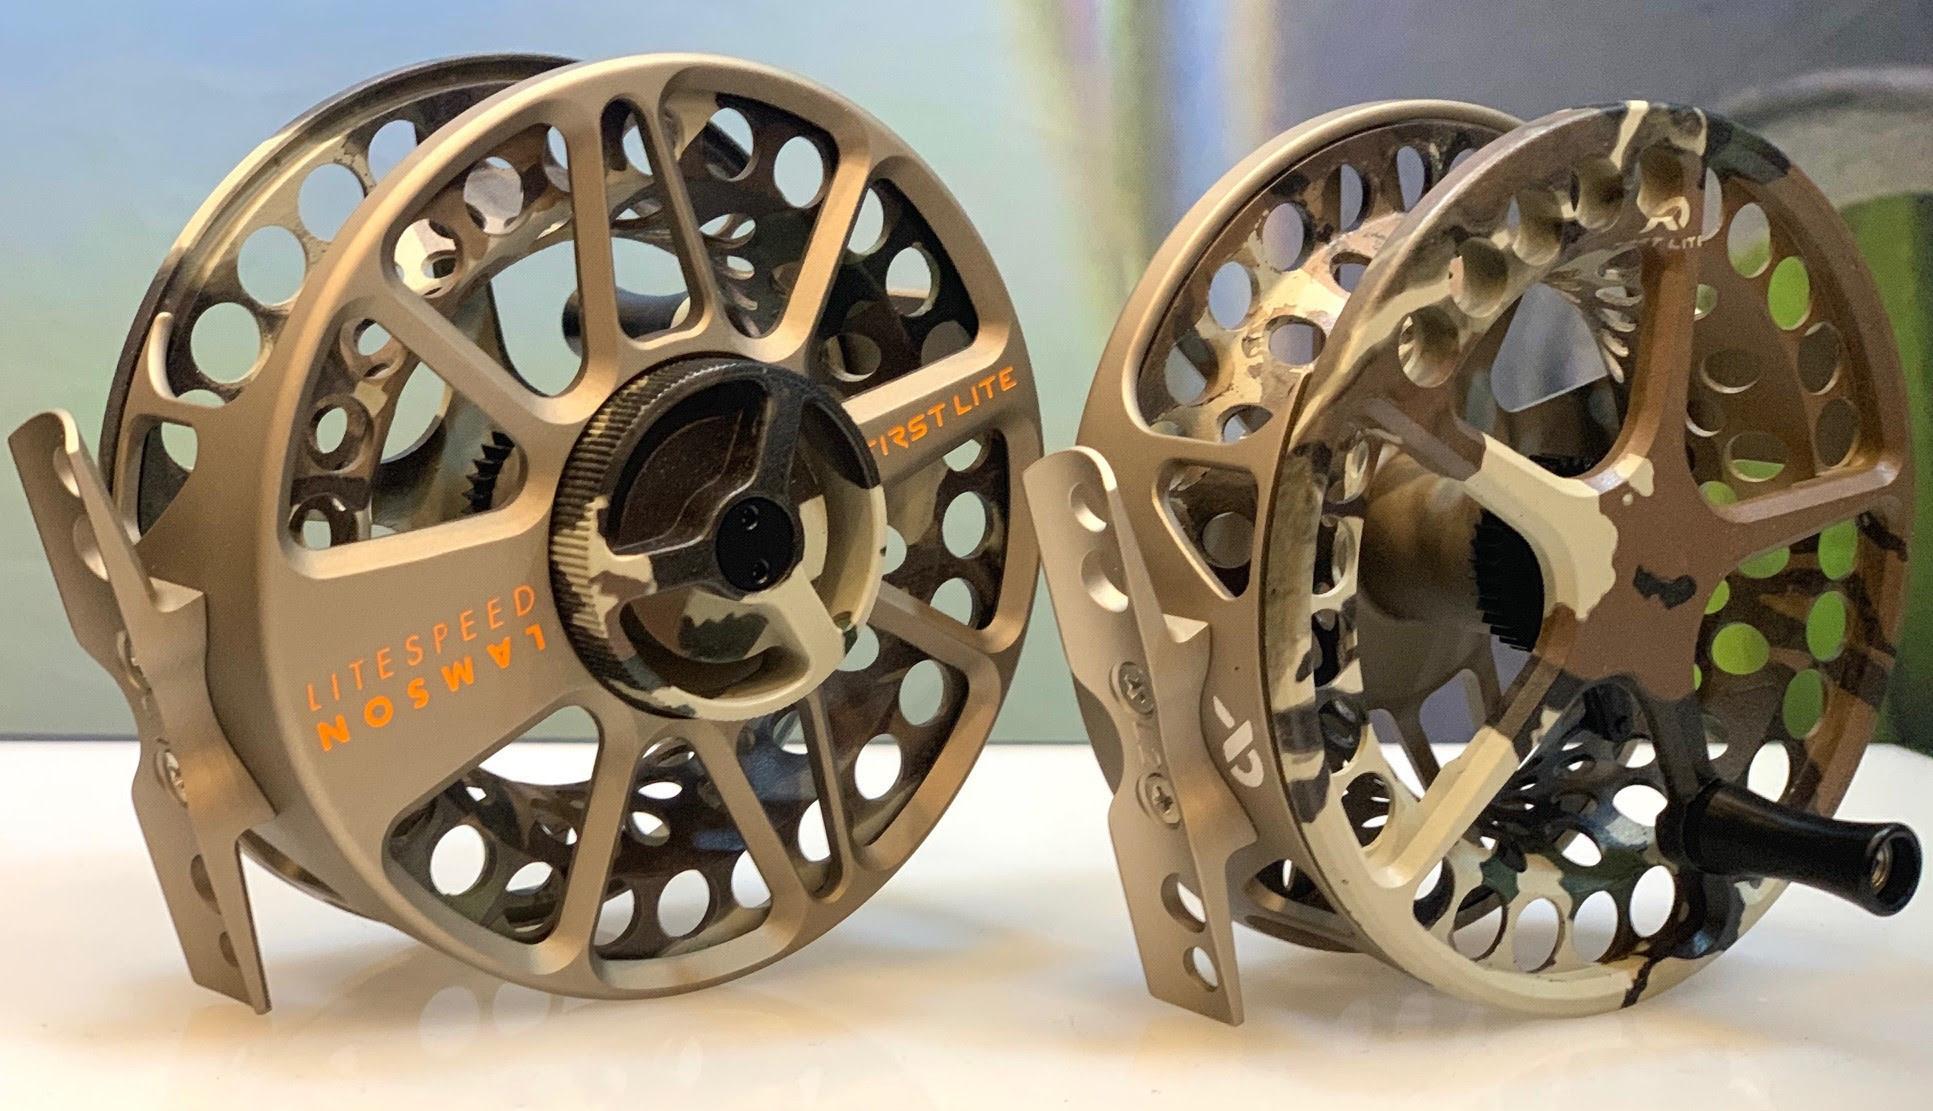 Waterworks Lamson Lamson Litespeed Reel - First Lite Fusion Camo